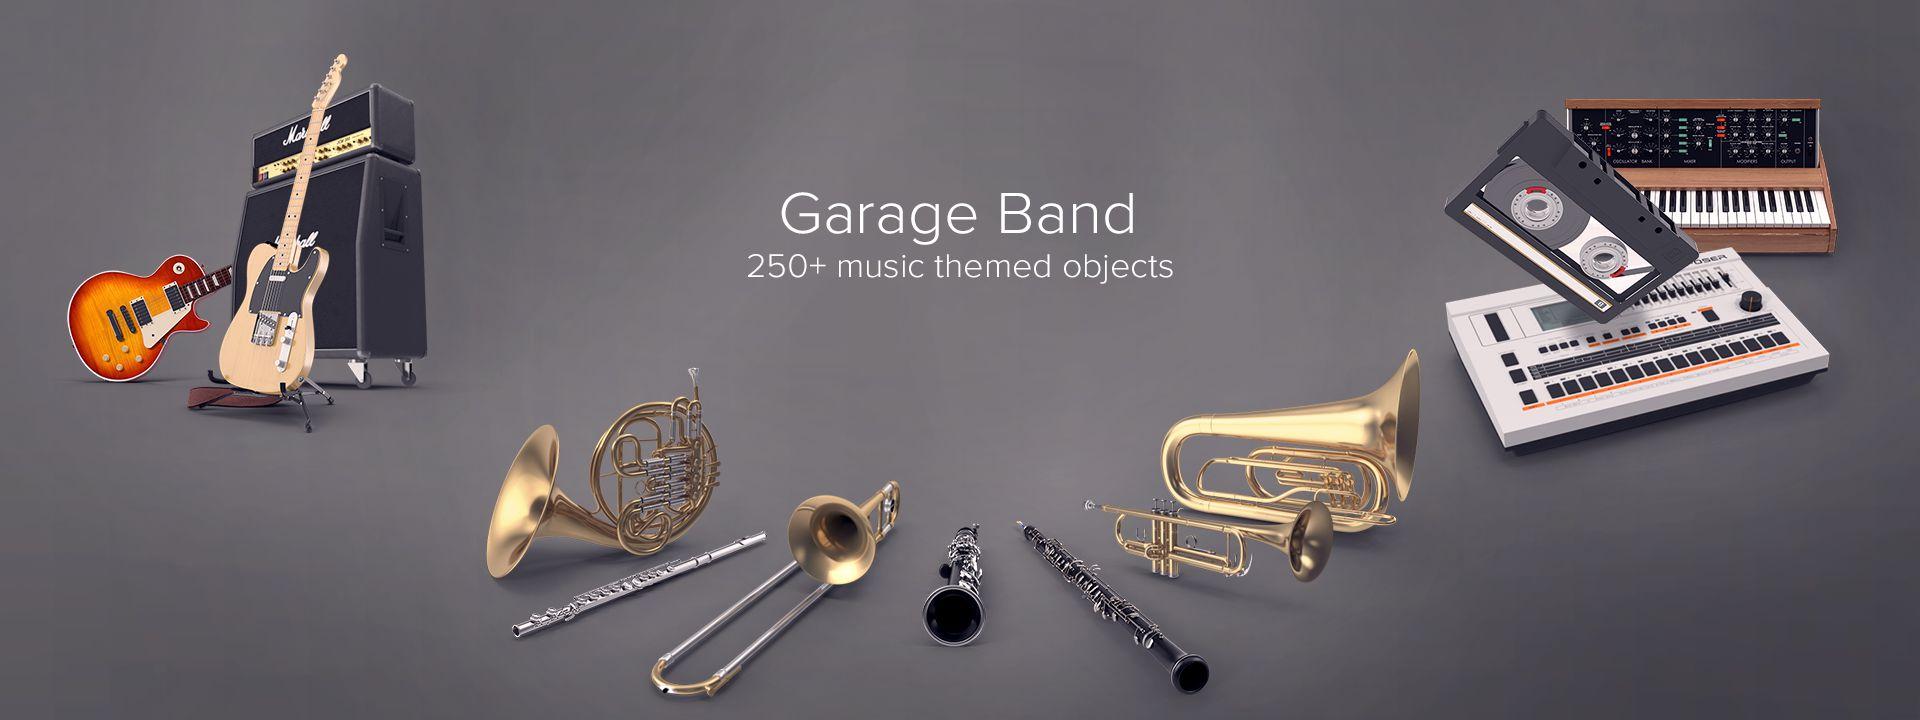 Garage Band Collection PNG Images & PSDs for Download   PixelSquid